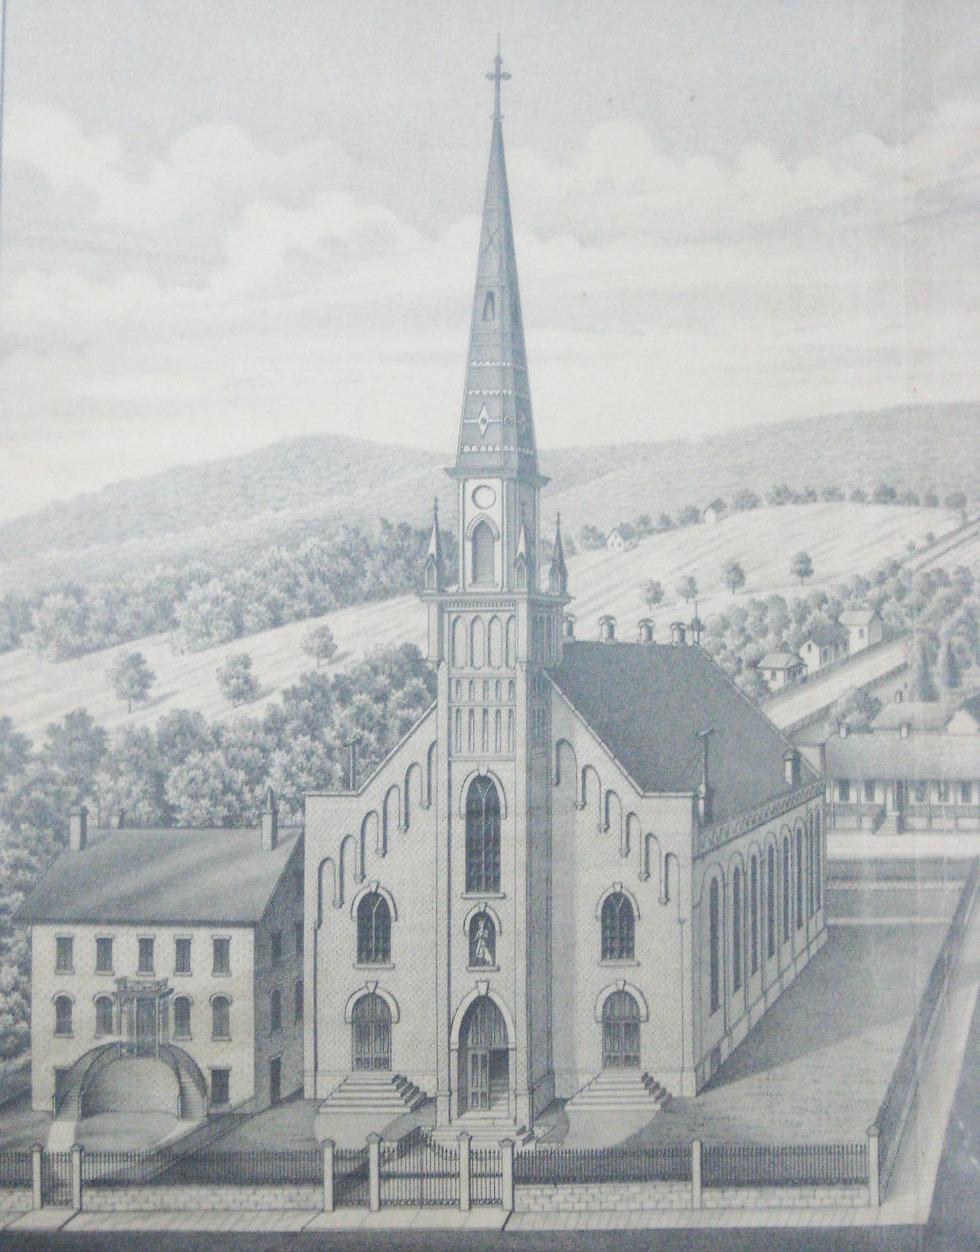 Ste_ Genevieve Church - 1882 St_ Francoi